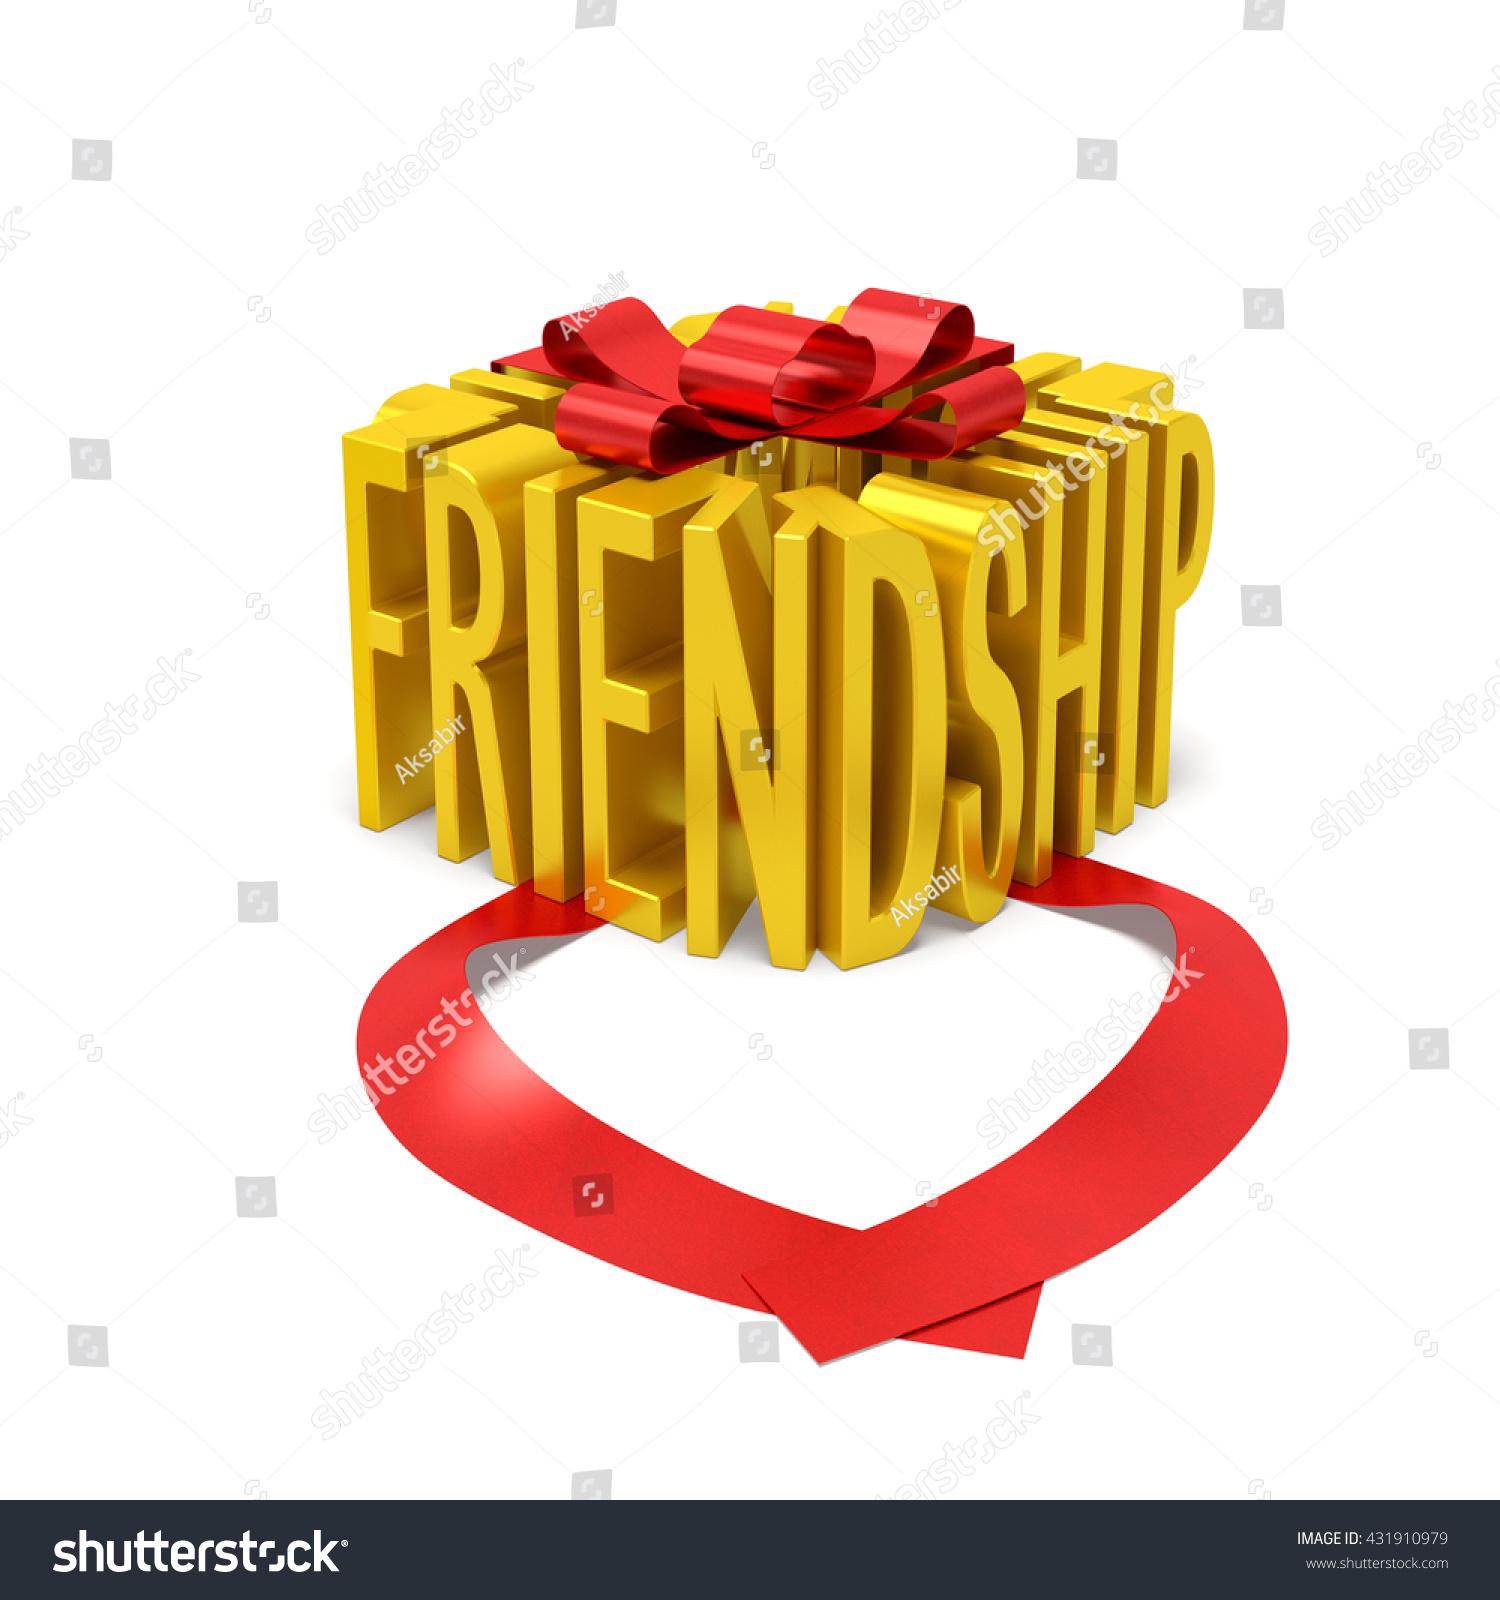 Friendship Creative Concept Golden Word Gift Stock Illustration